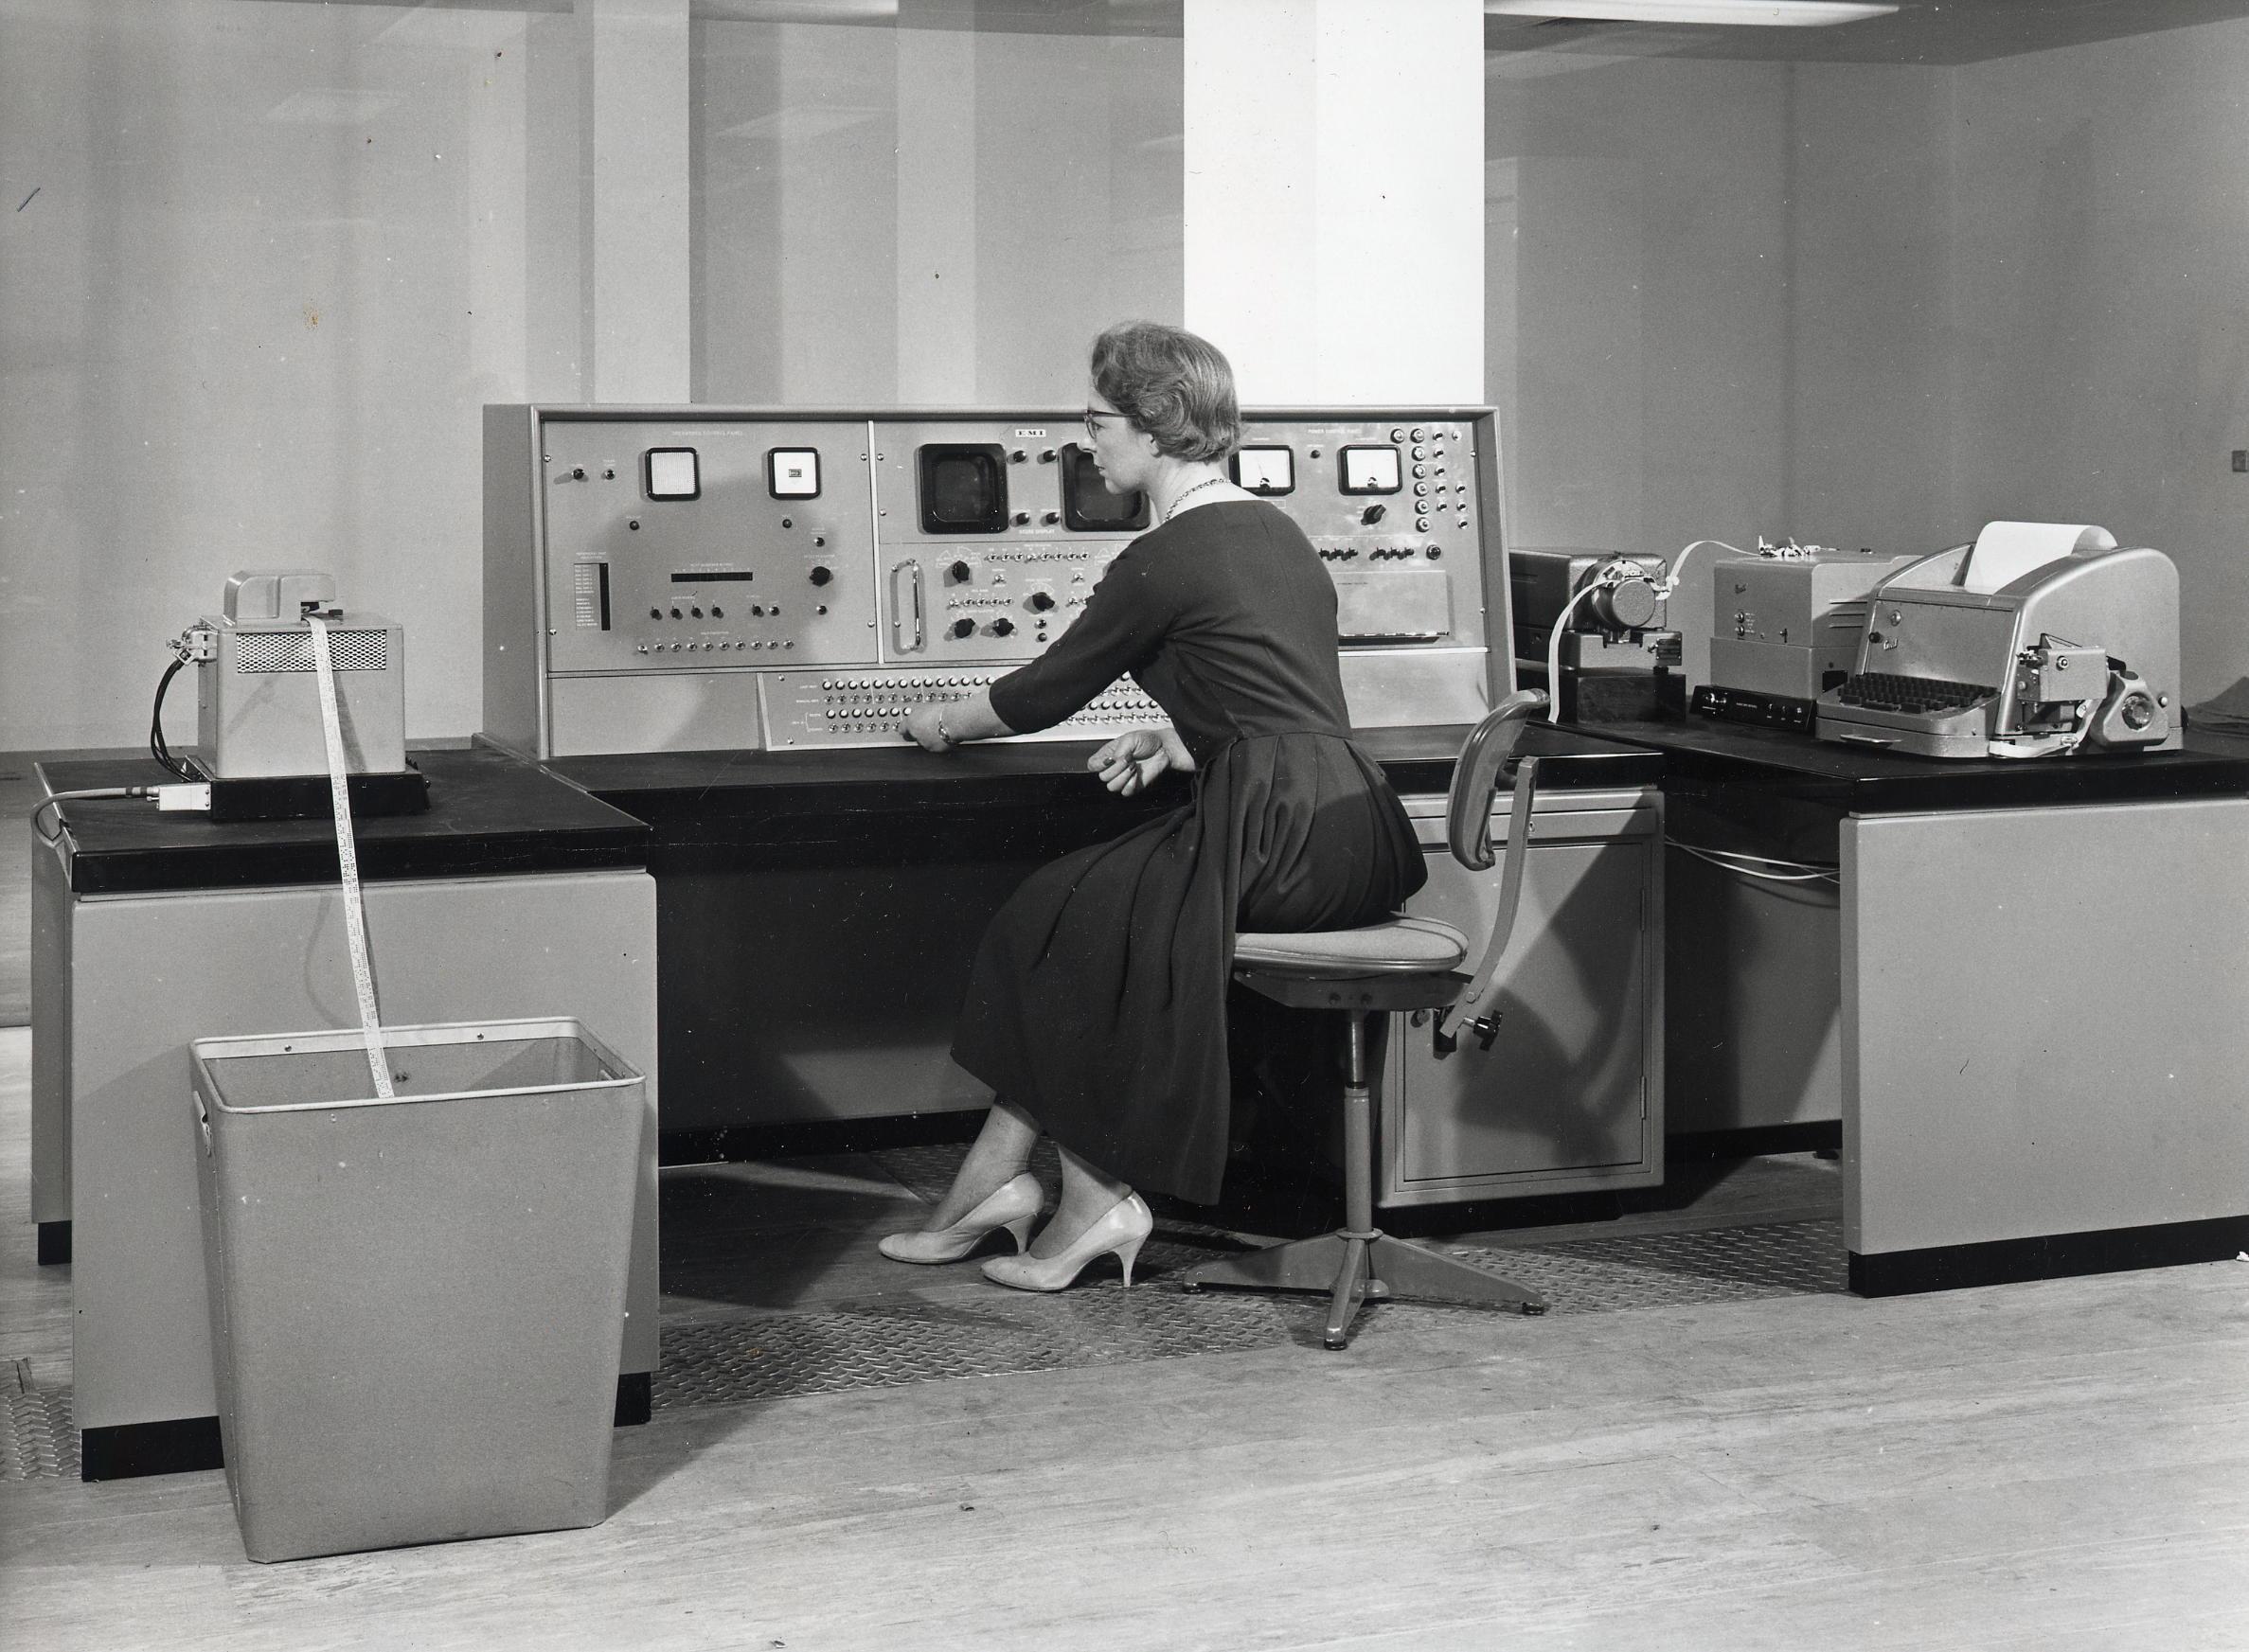 At Barclays No. 1 Computer Centre (1959)